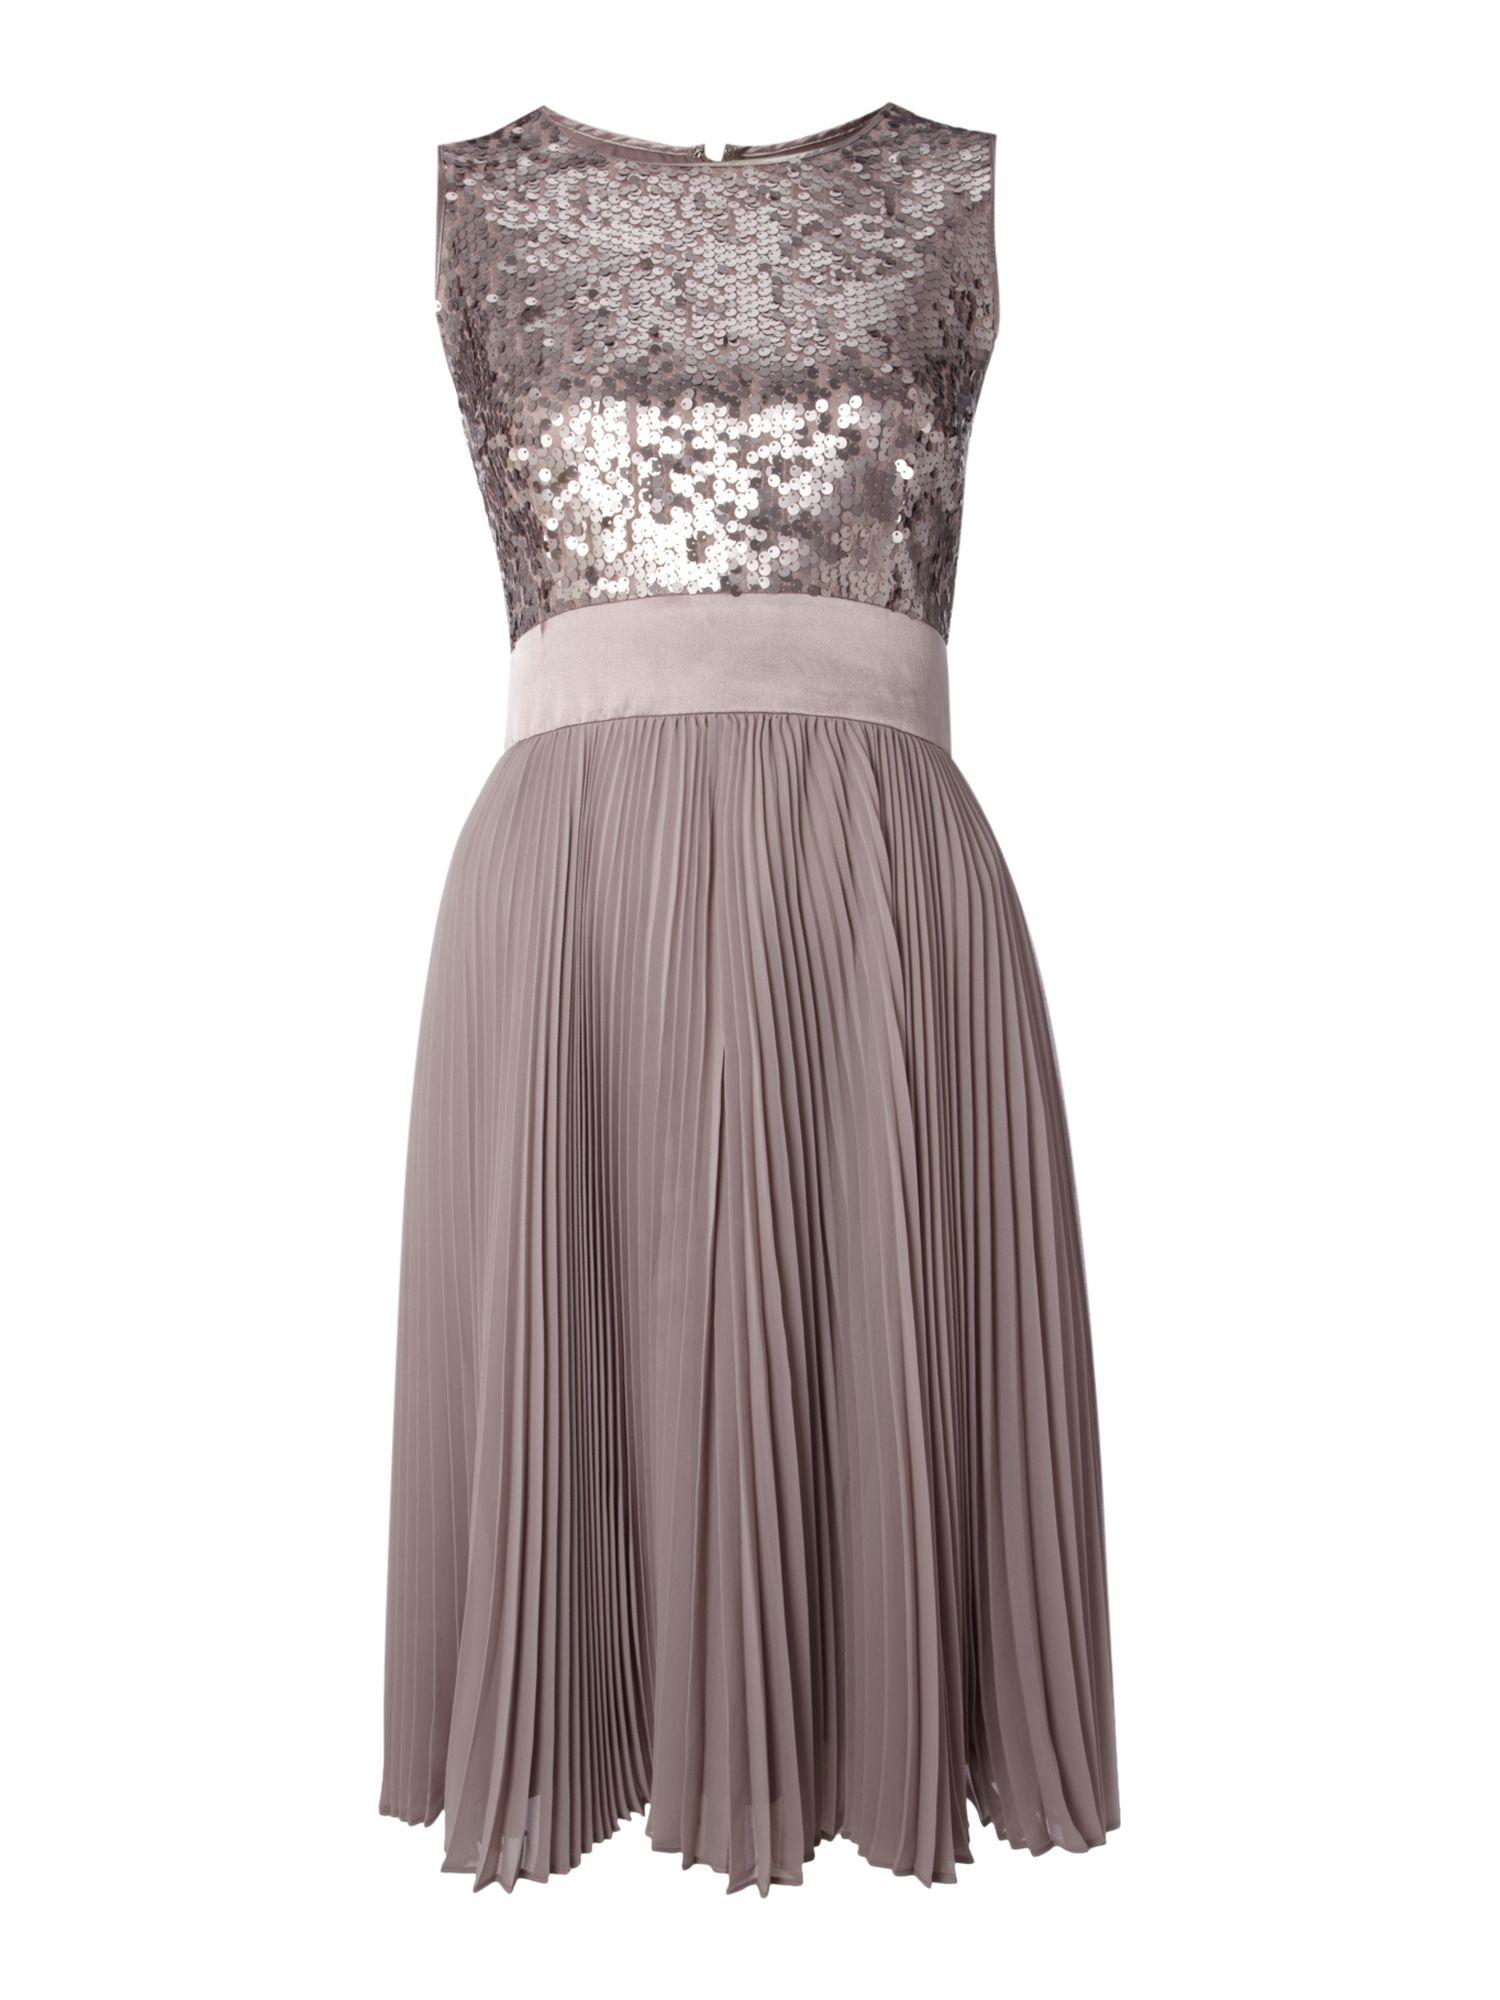 eliza j sequin top dress with pleated skirt in beige